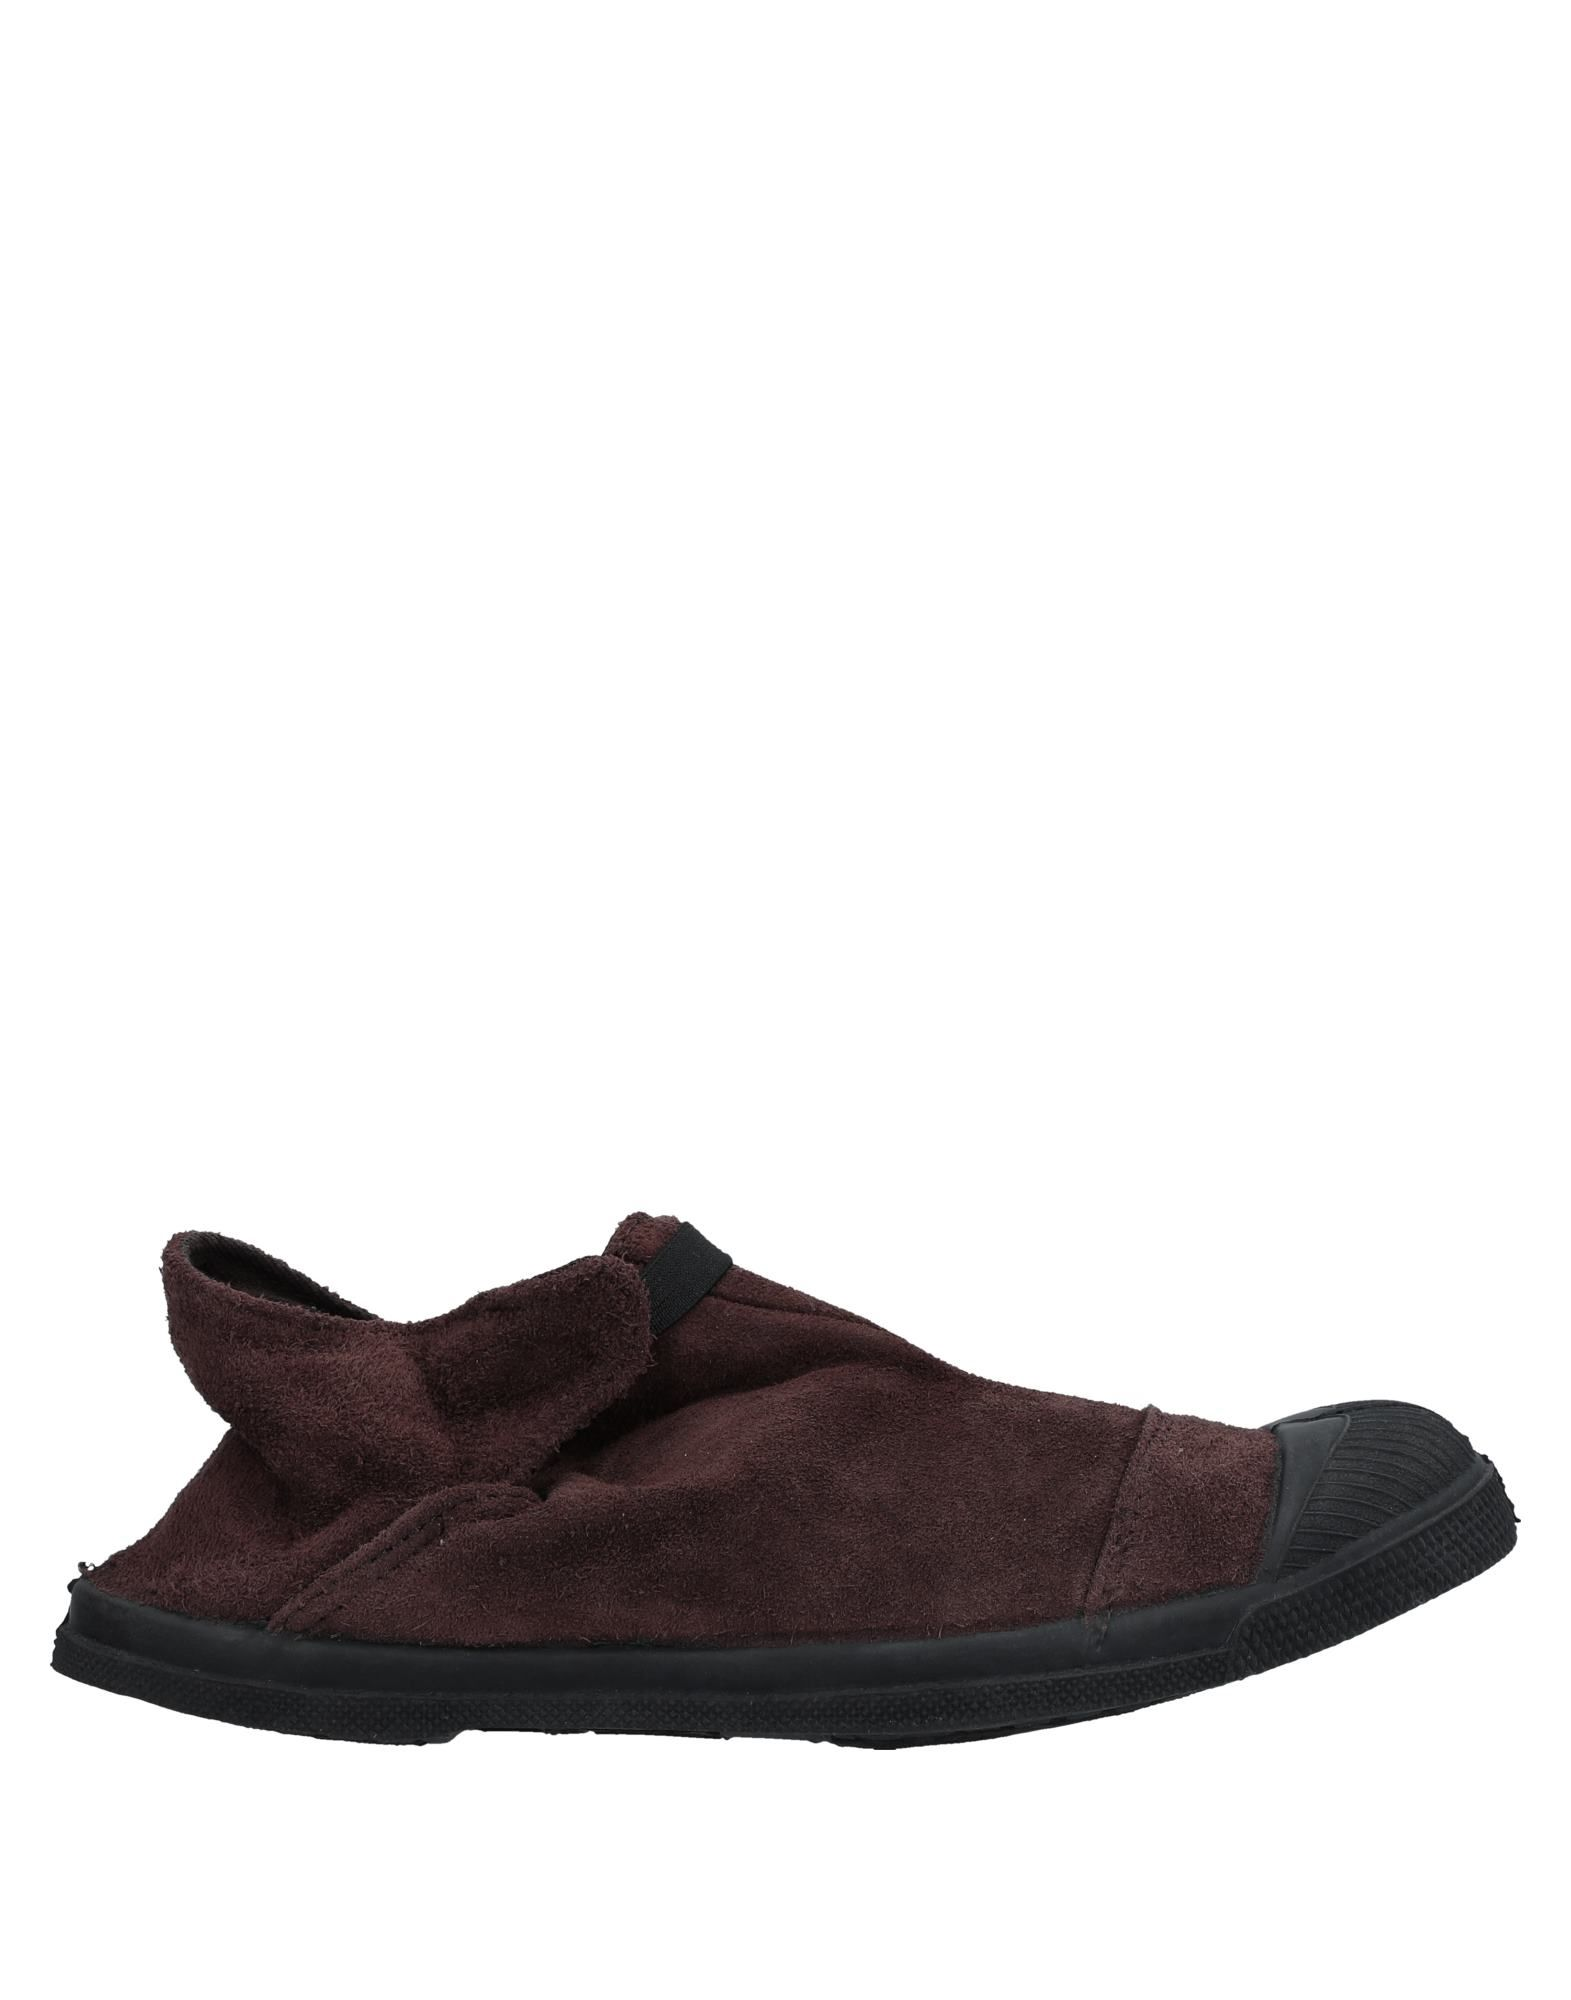 Bensimon Gute Sneakers Damen  11525661UH Gute Bensimon Qualität beliebte Schuhe df429d